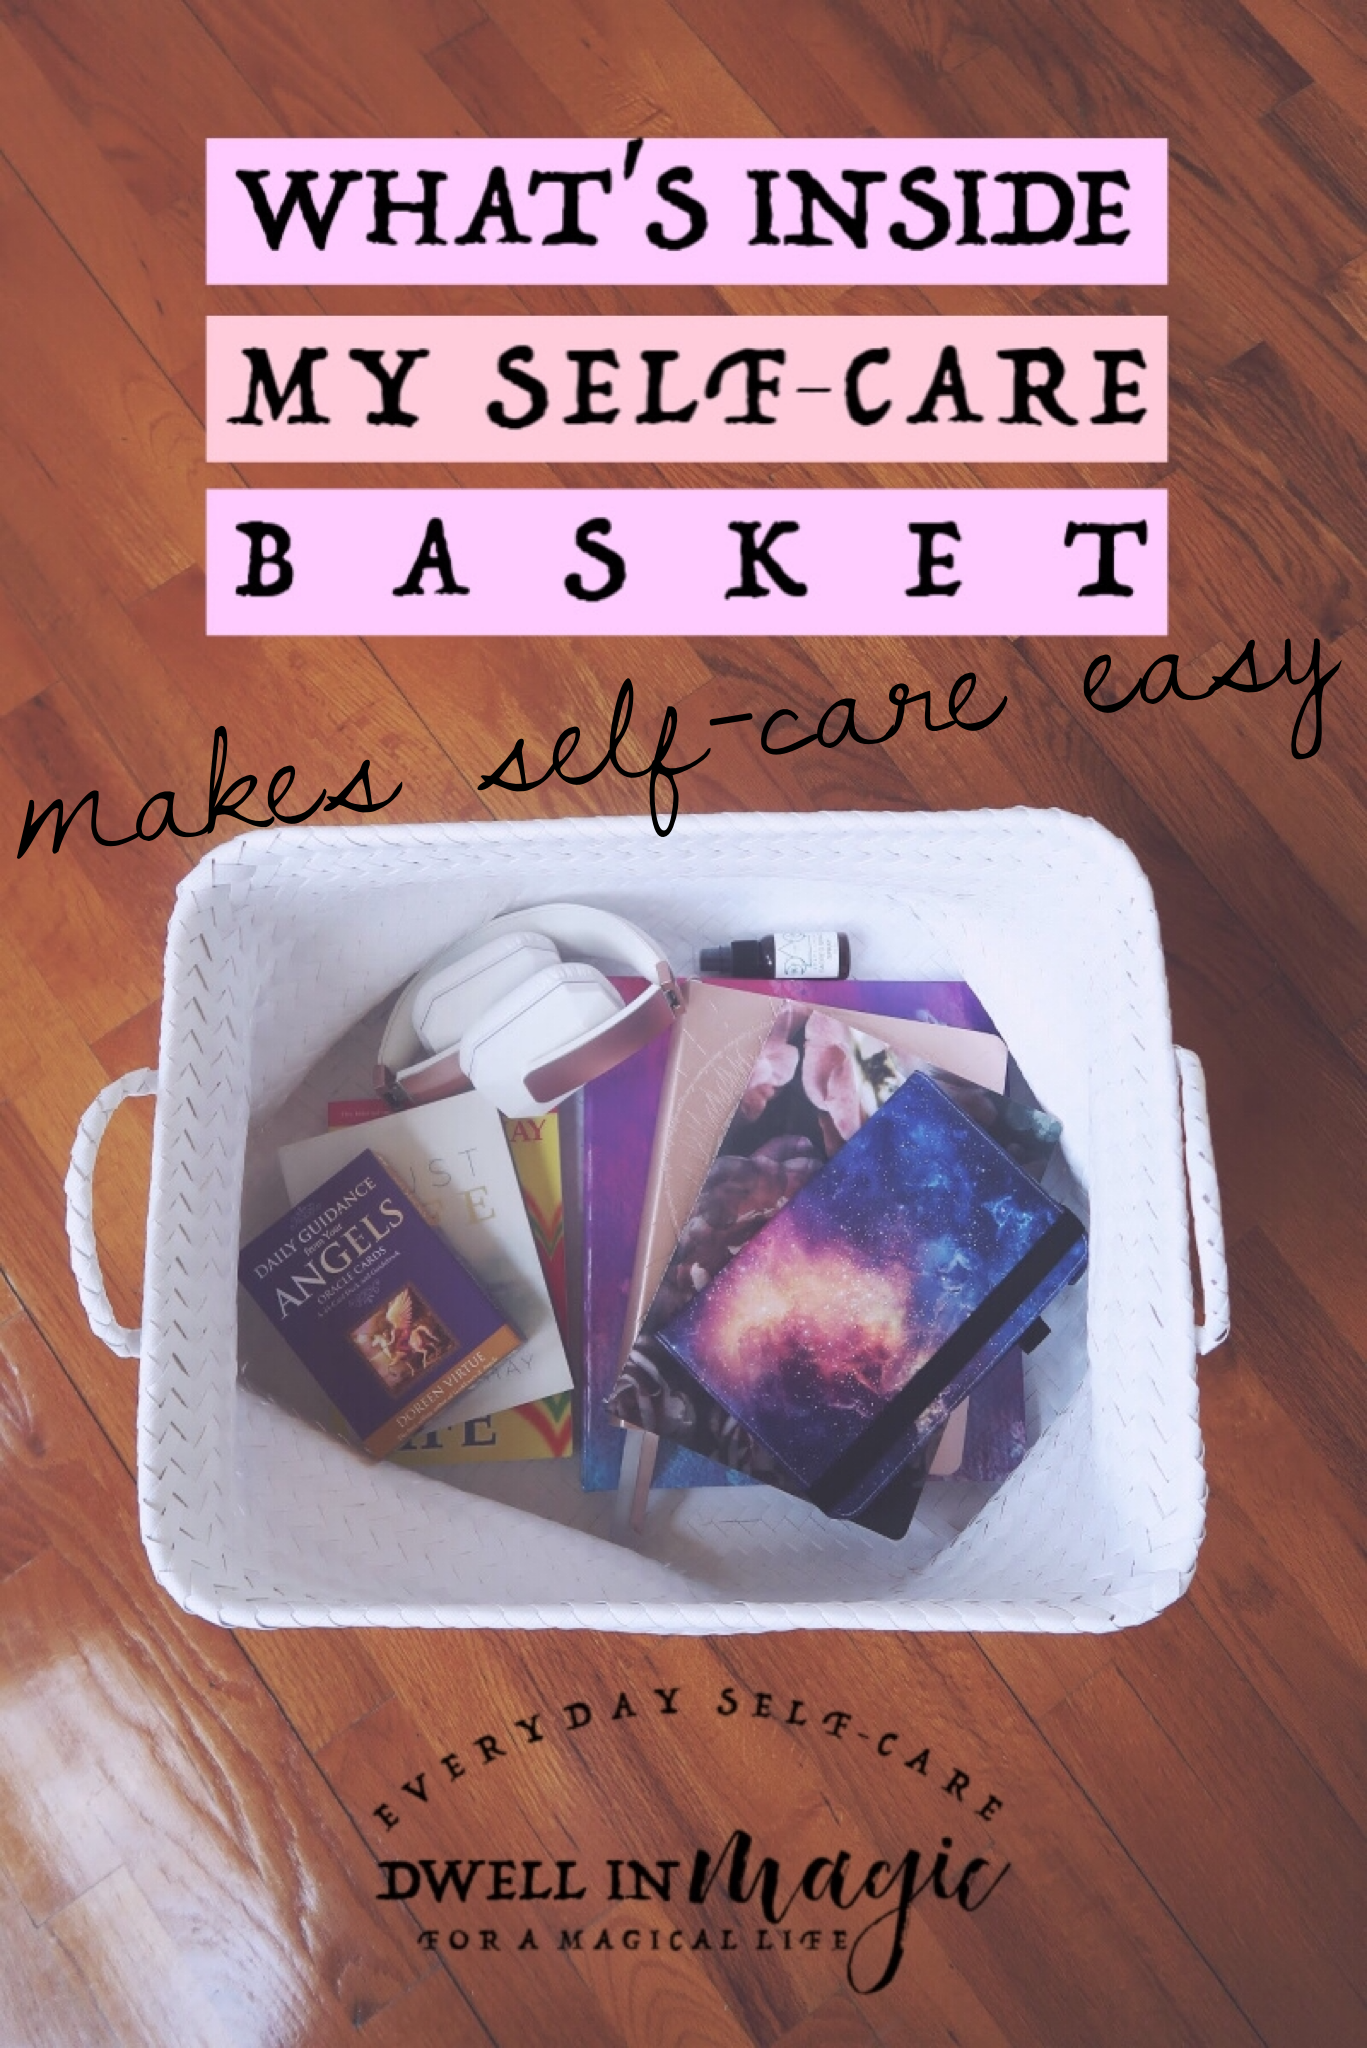 Creating a self-care basket